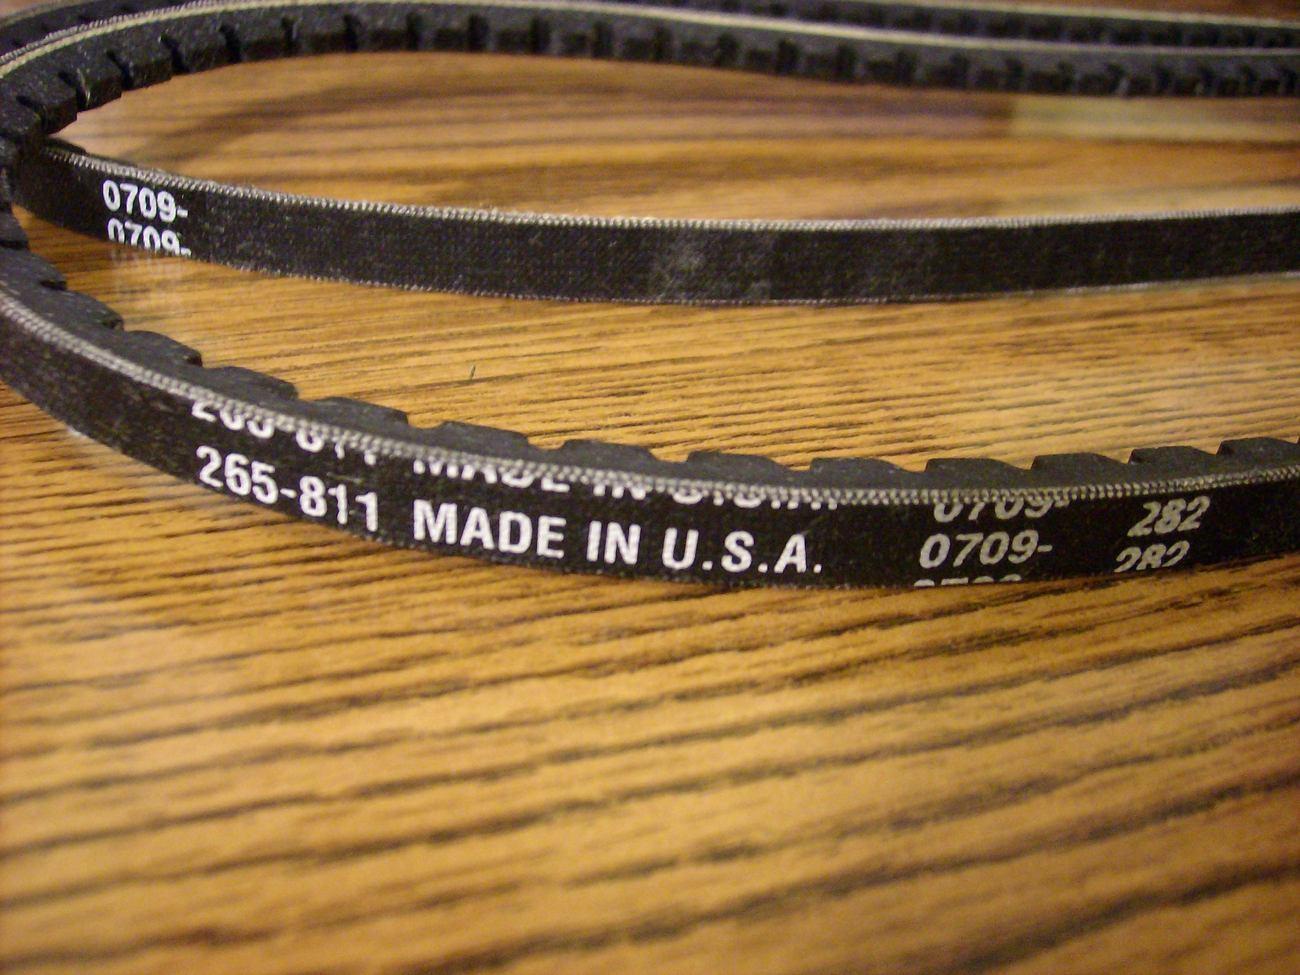 MTD Auger Drive Belts Set, 754-0430, 754-0430A, 954-0356, 754-0356, snowblower